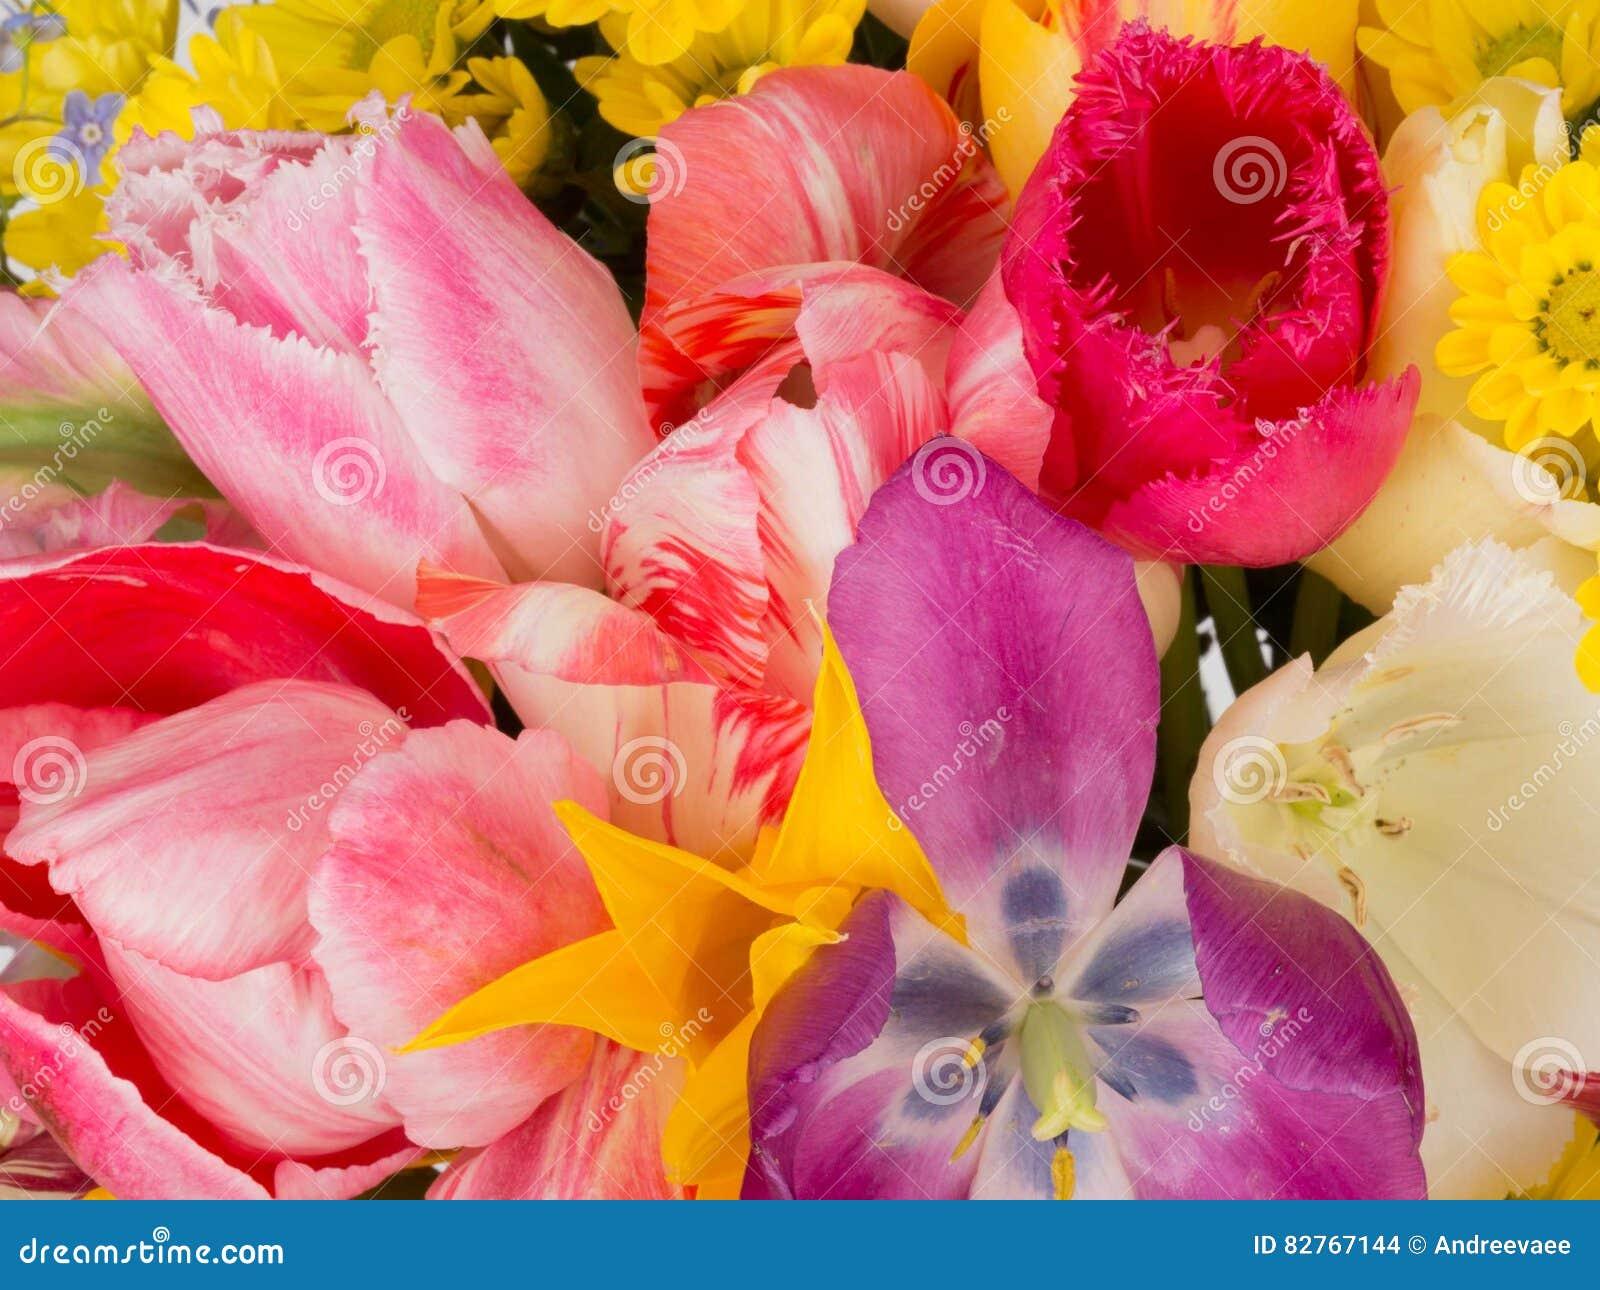 Beautiful flowers in a bouquet stock photo image of flowers white beautiful flowers in a bouquet izmirmasajfo